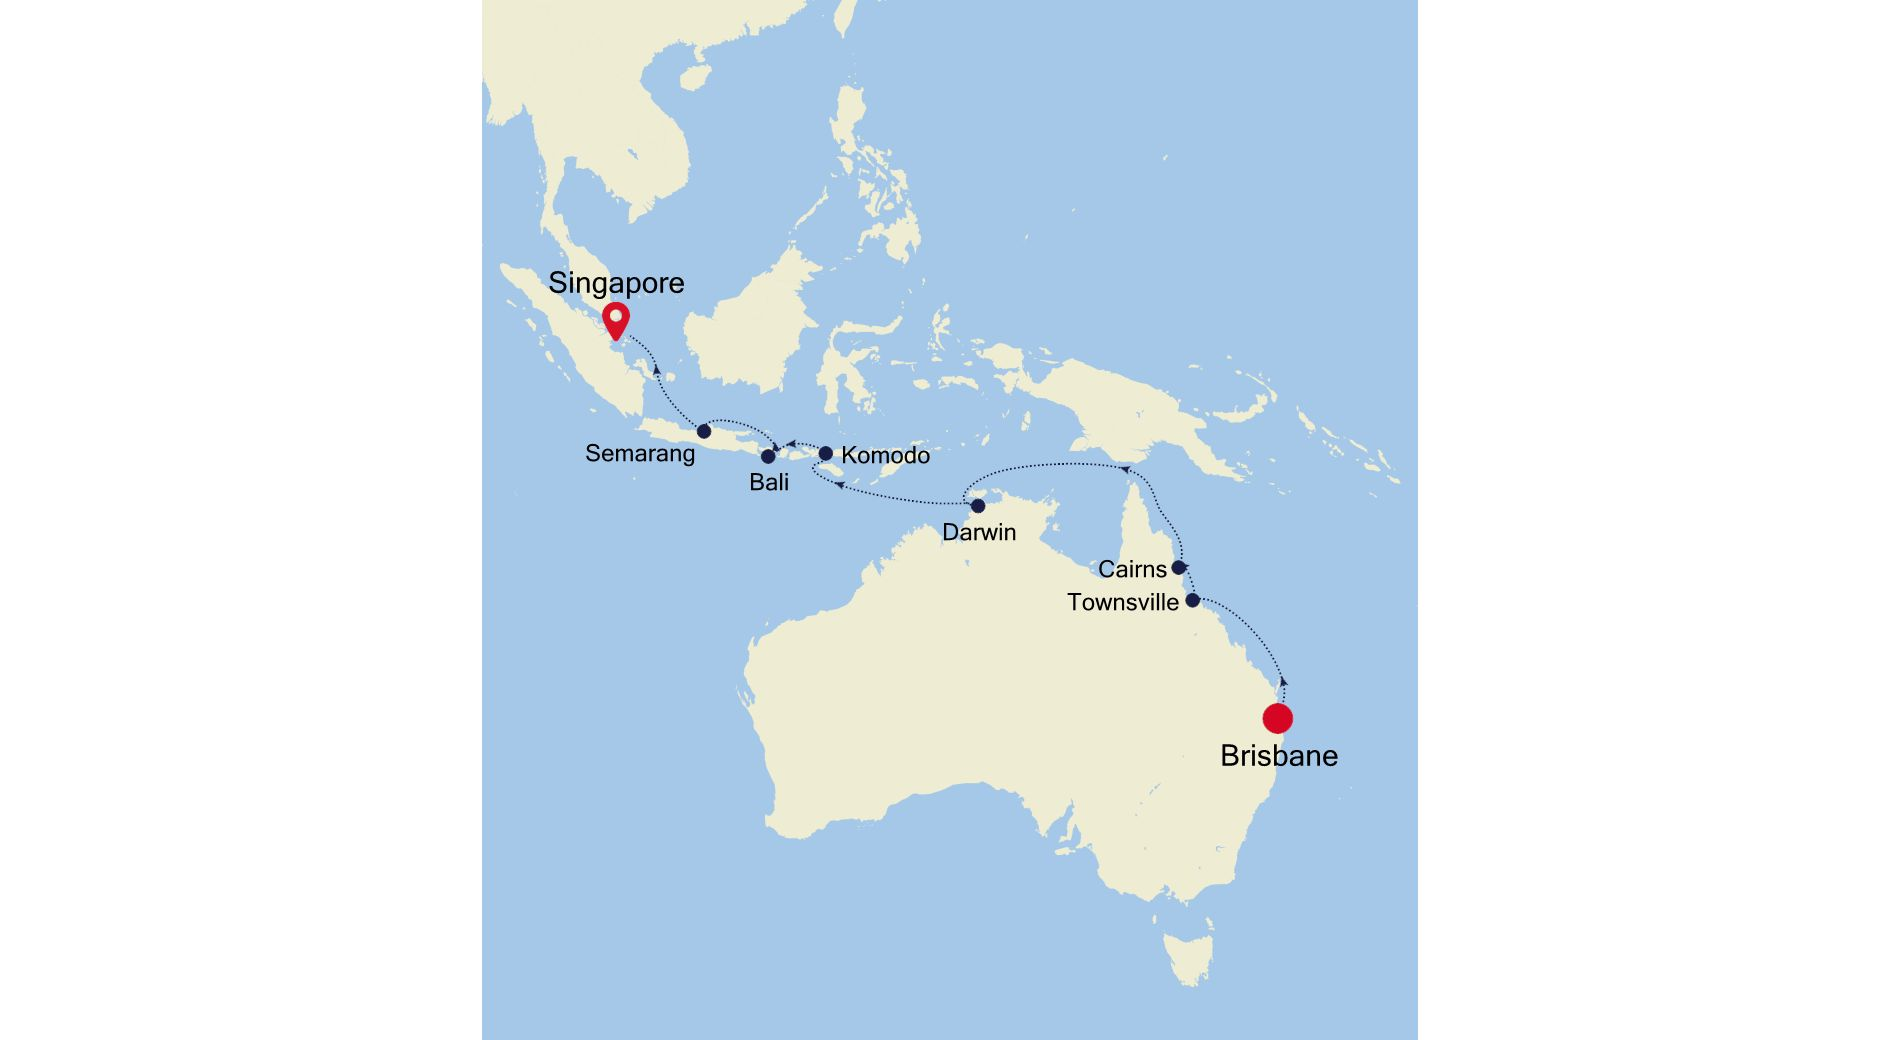 SM210221016 - Brisbane to Singapore